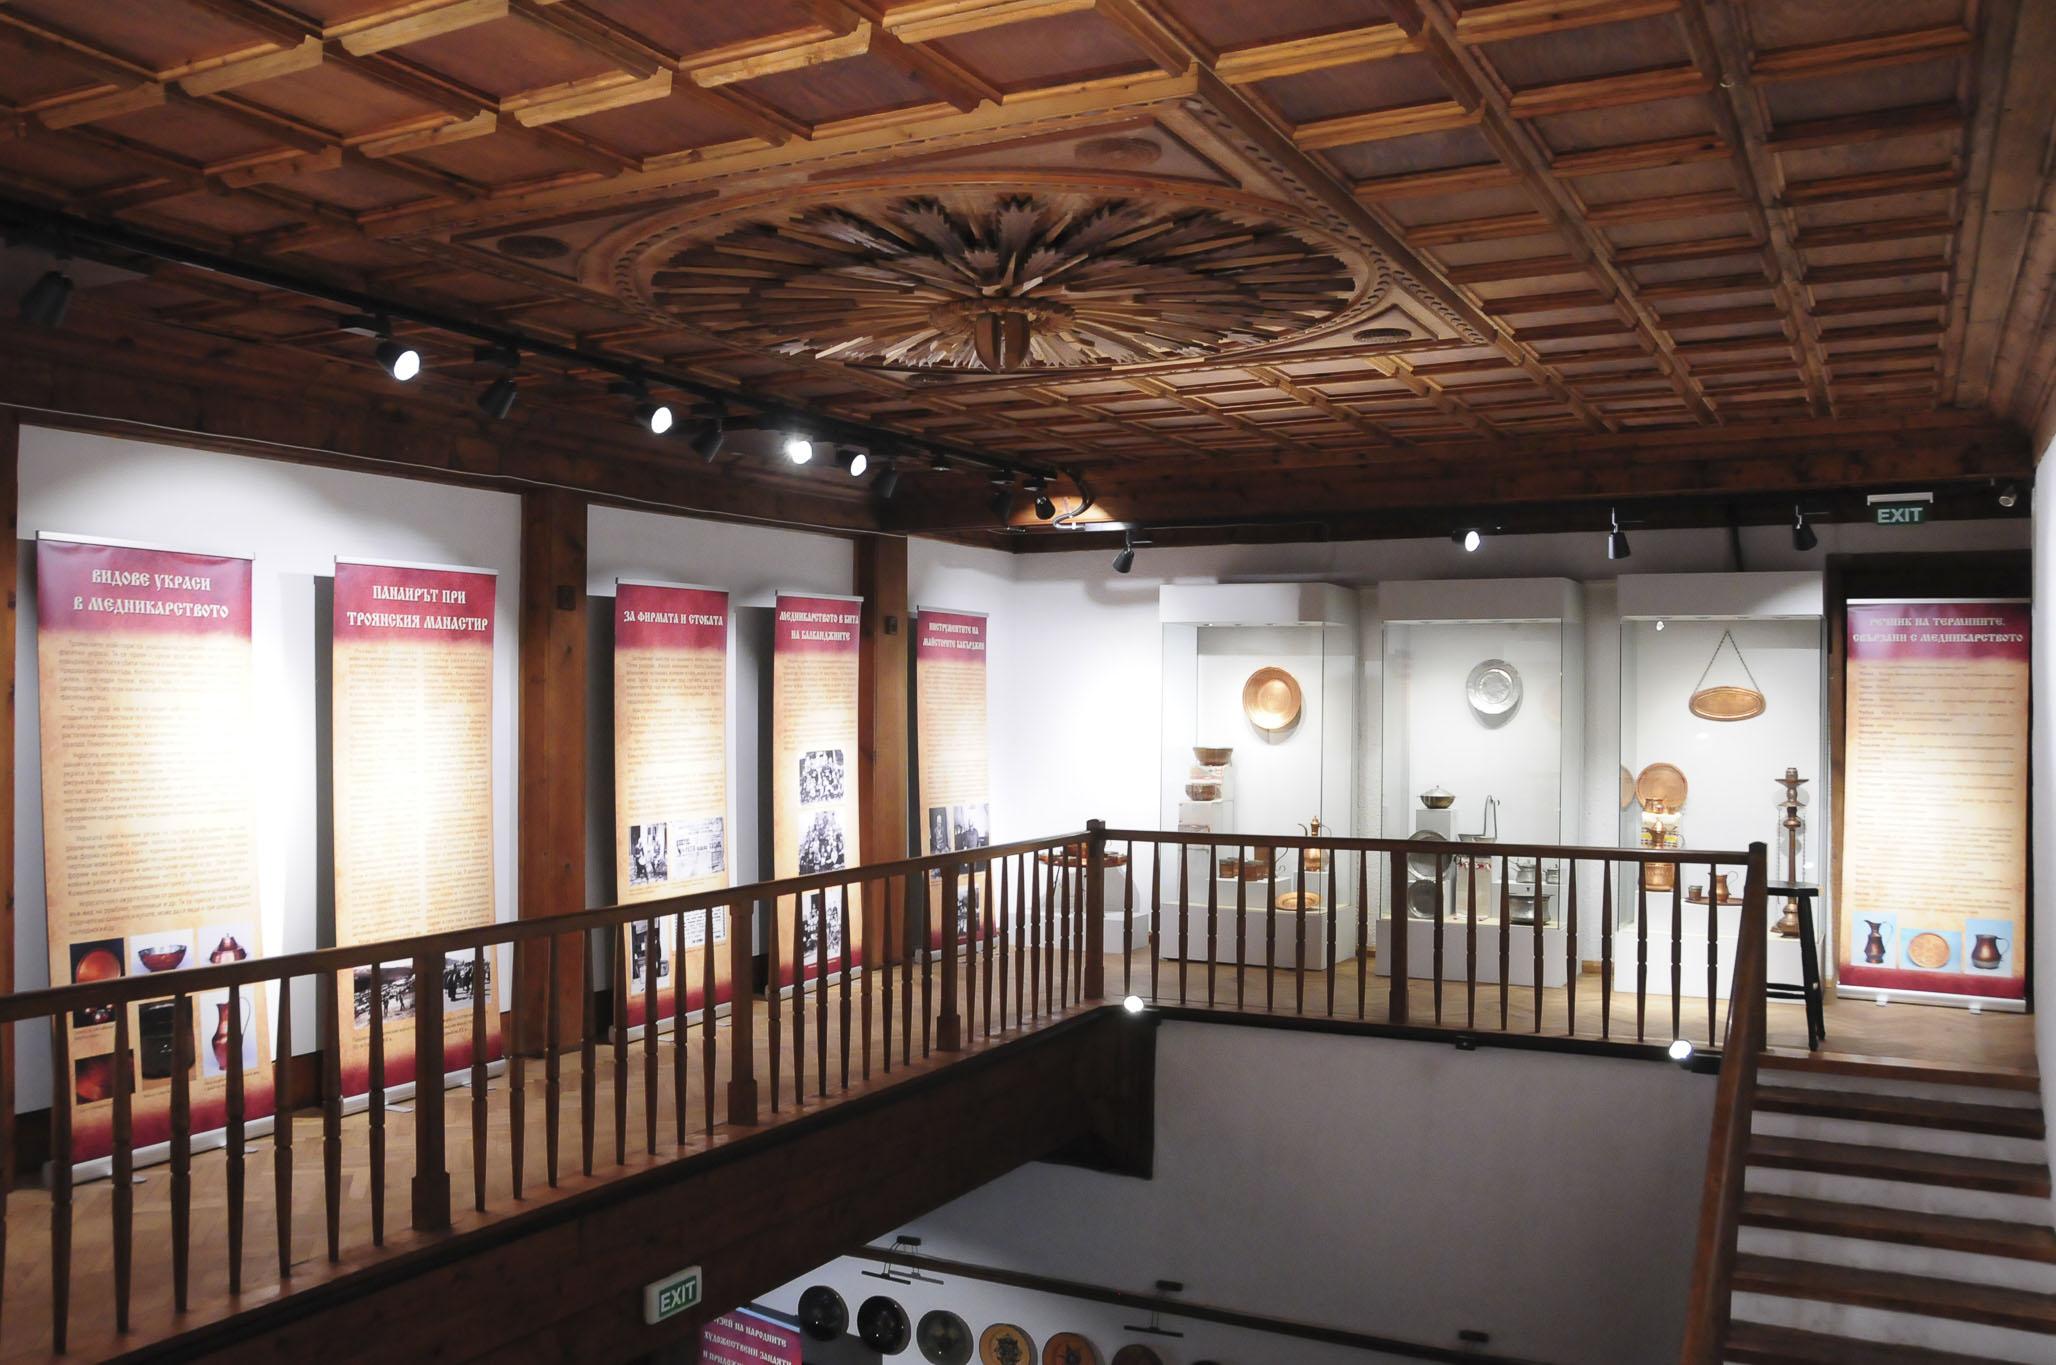 troyan-museum-mednikarstvo-ot-troyanskiq-krai-33